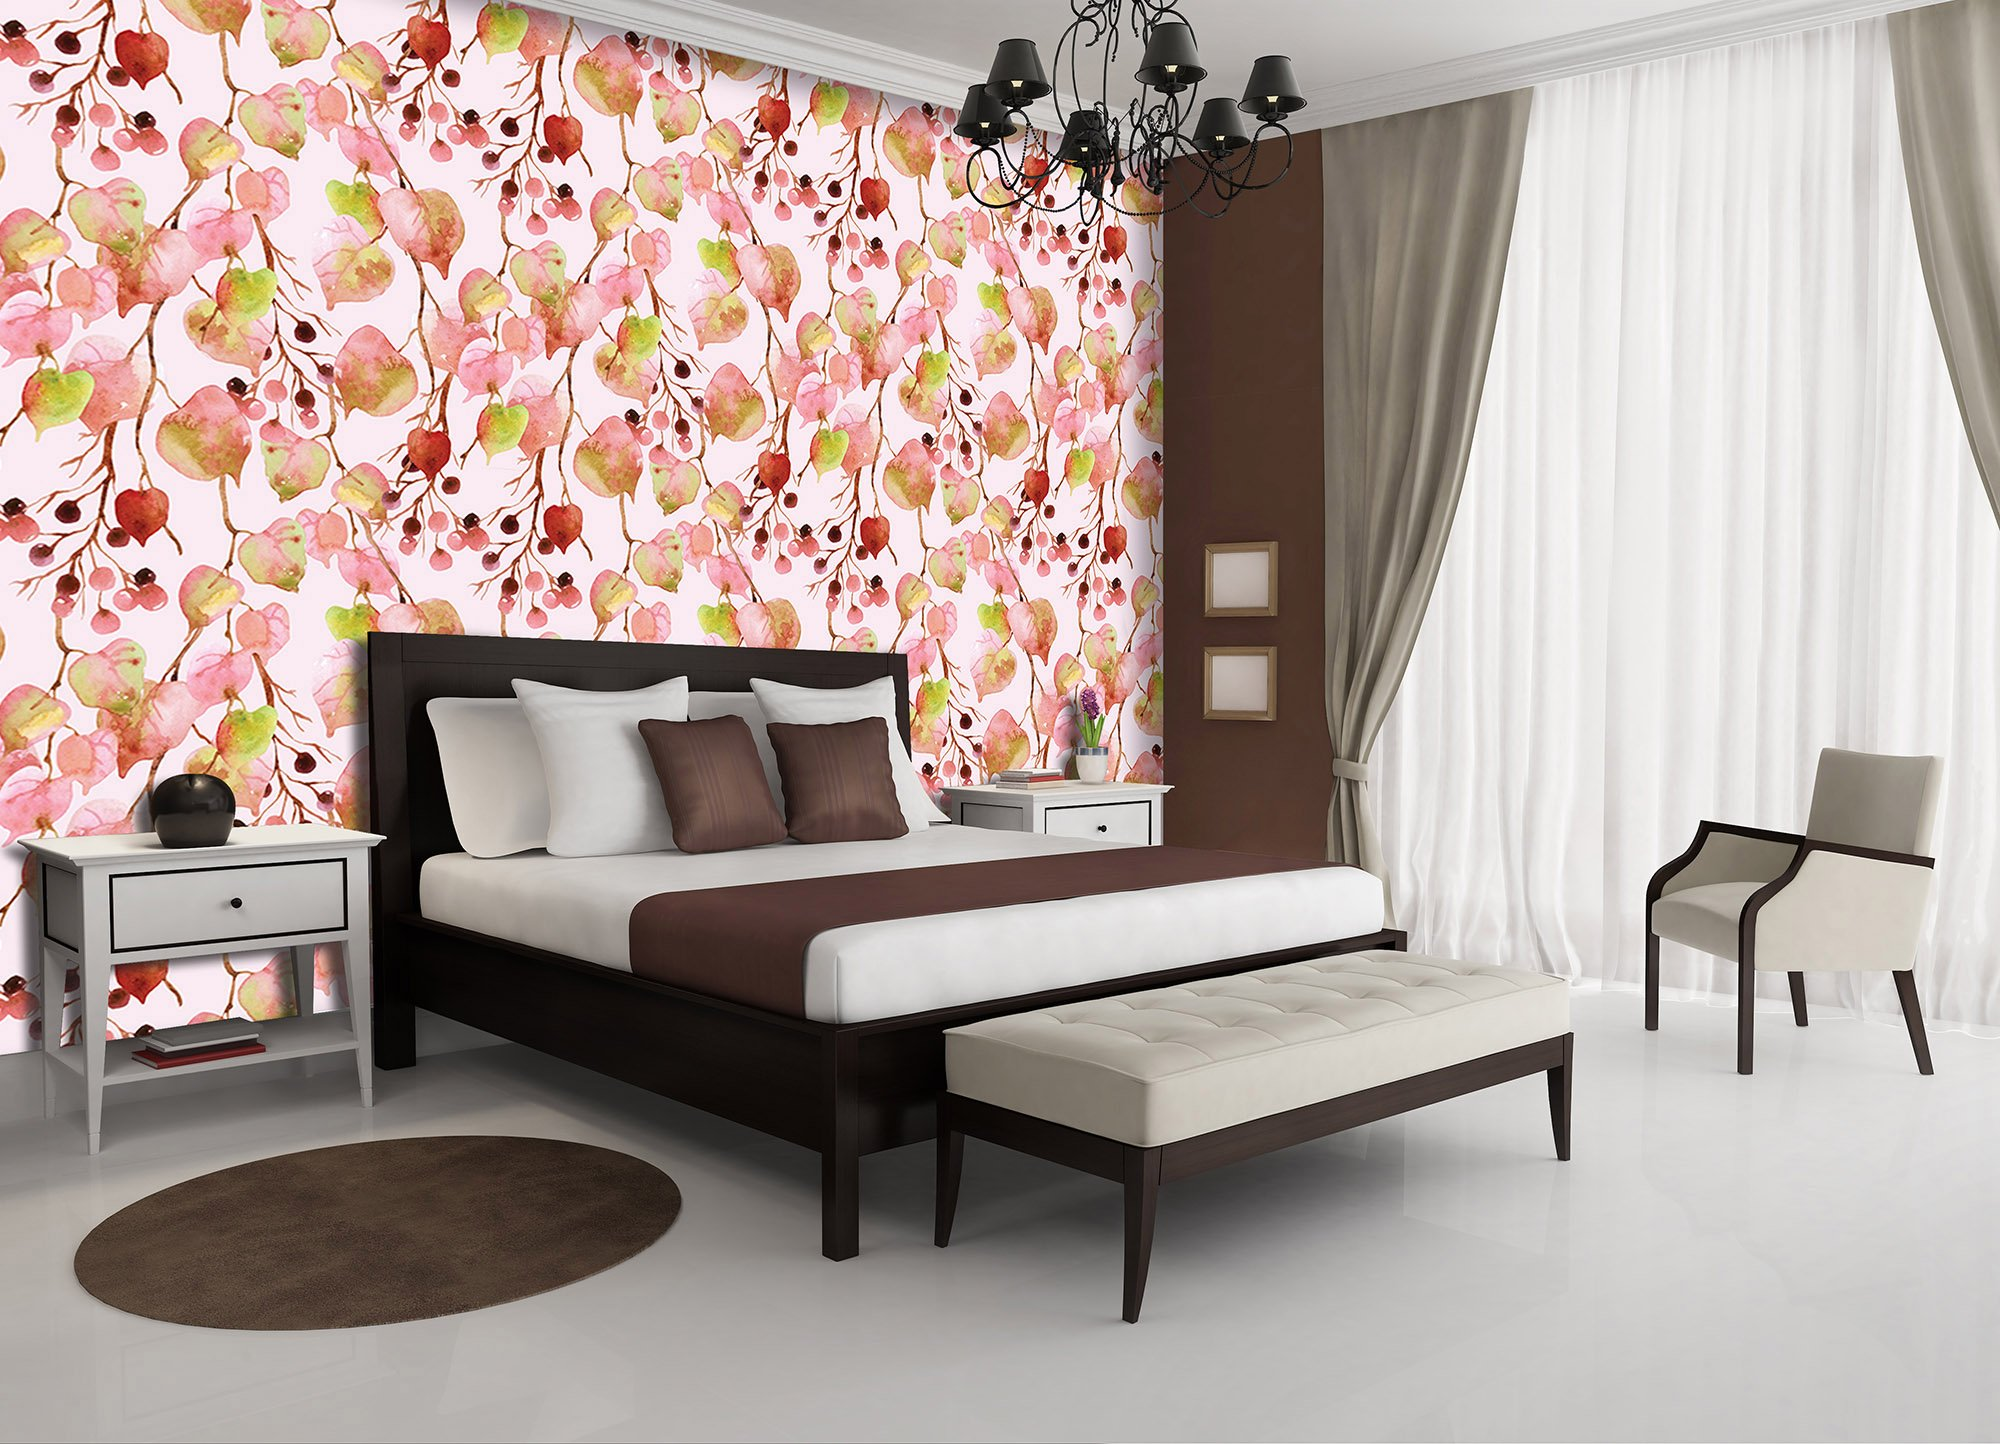 xxl fototapete mit rosa herbstlaub weltderbilder. Black Bedroom Furniture Sets. Home Design Ideas